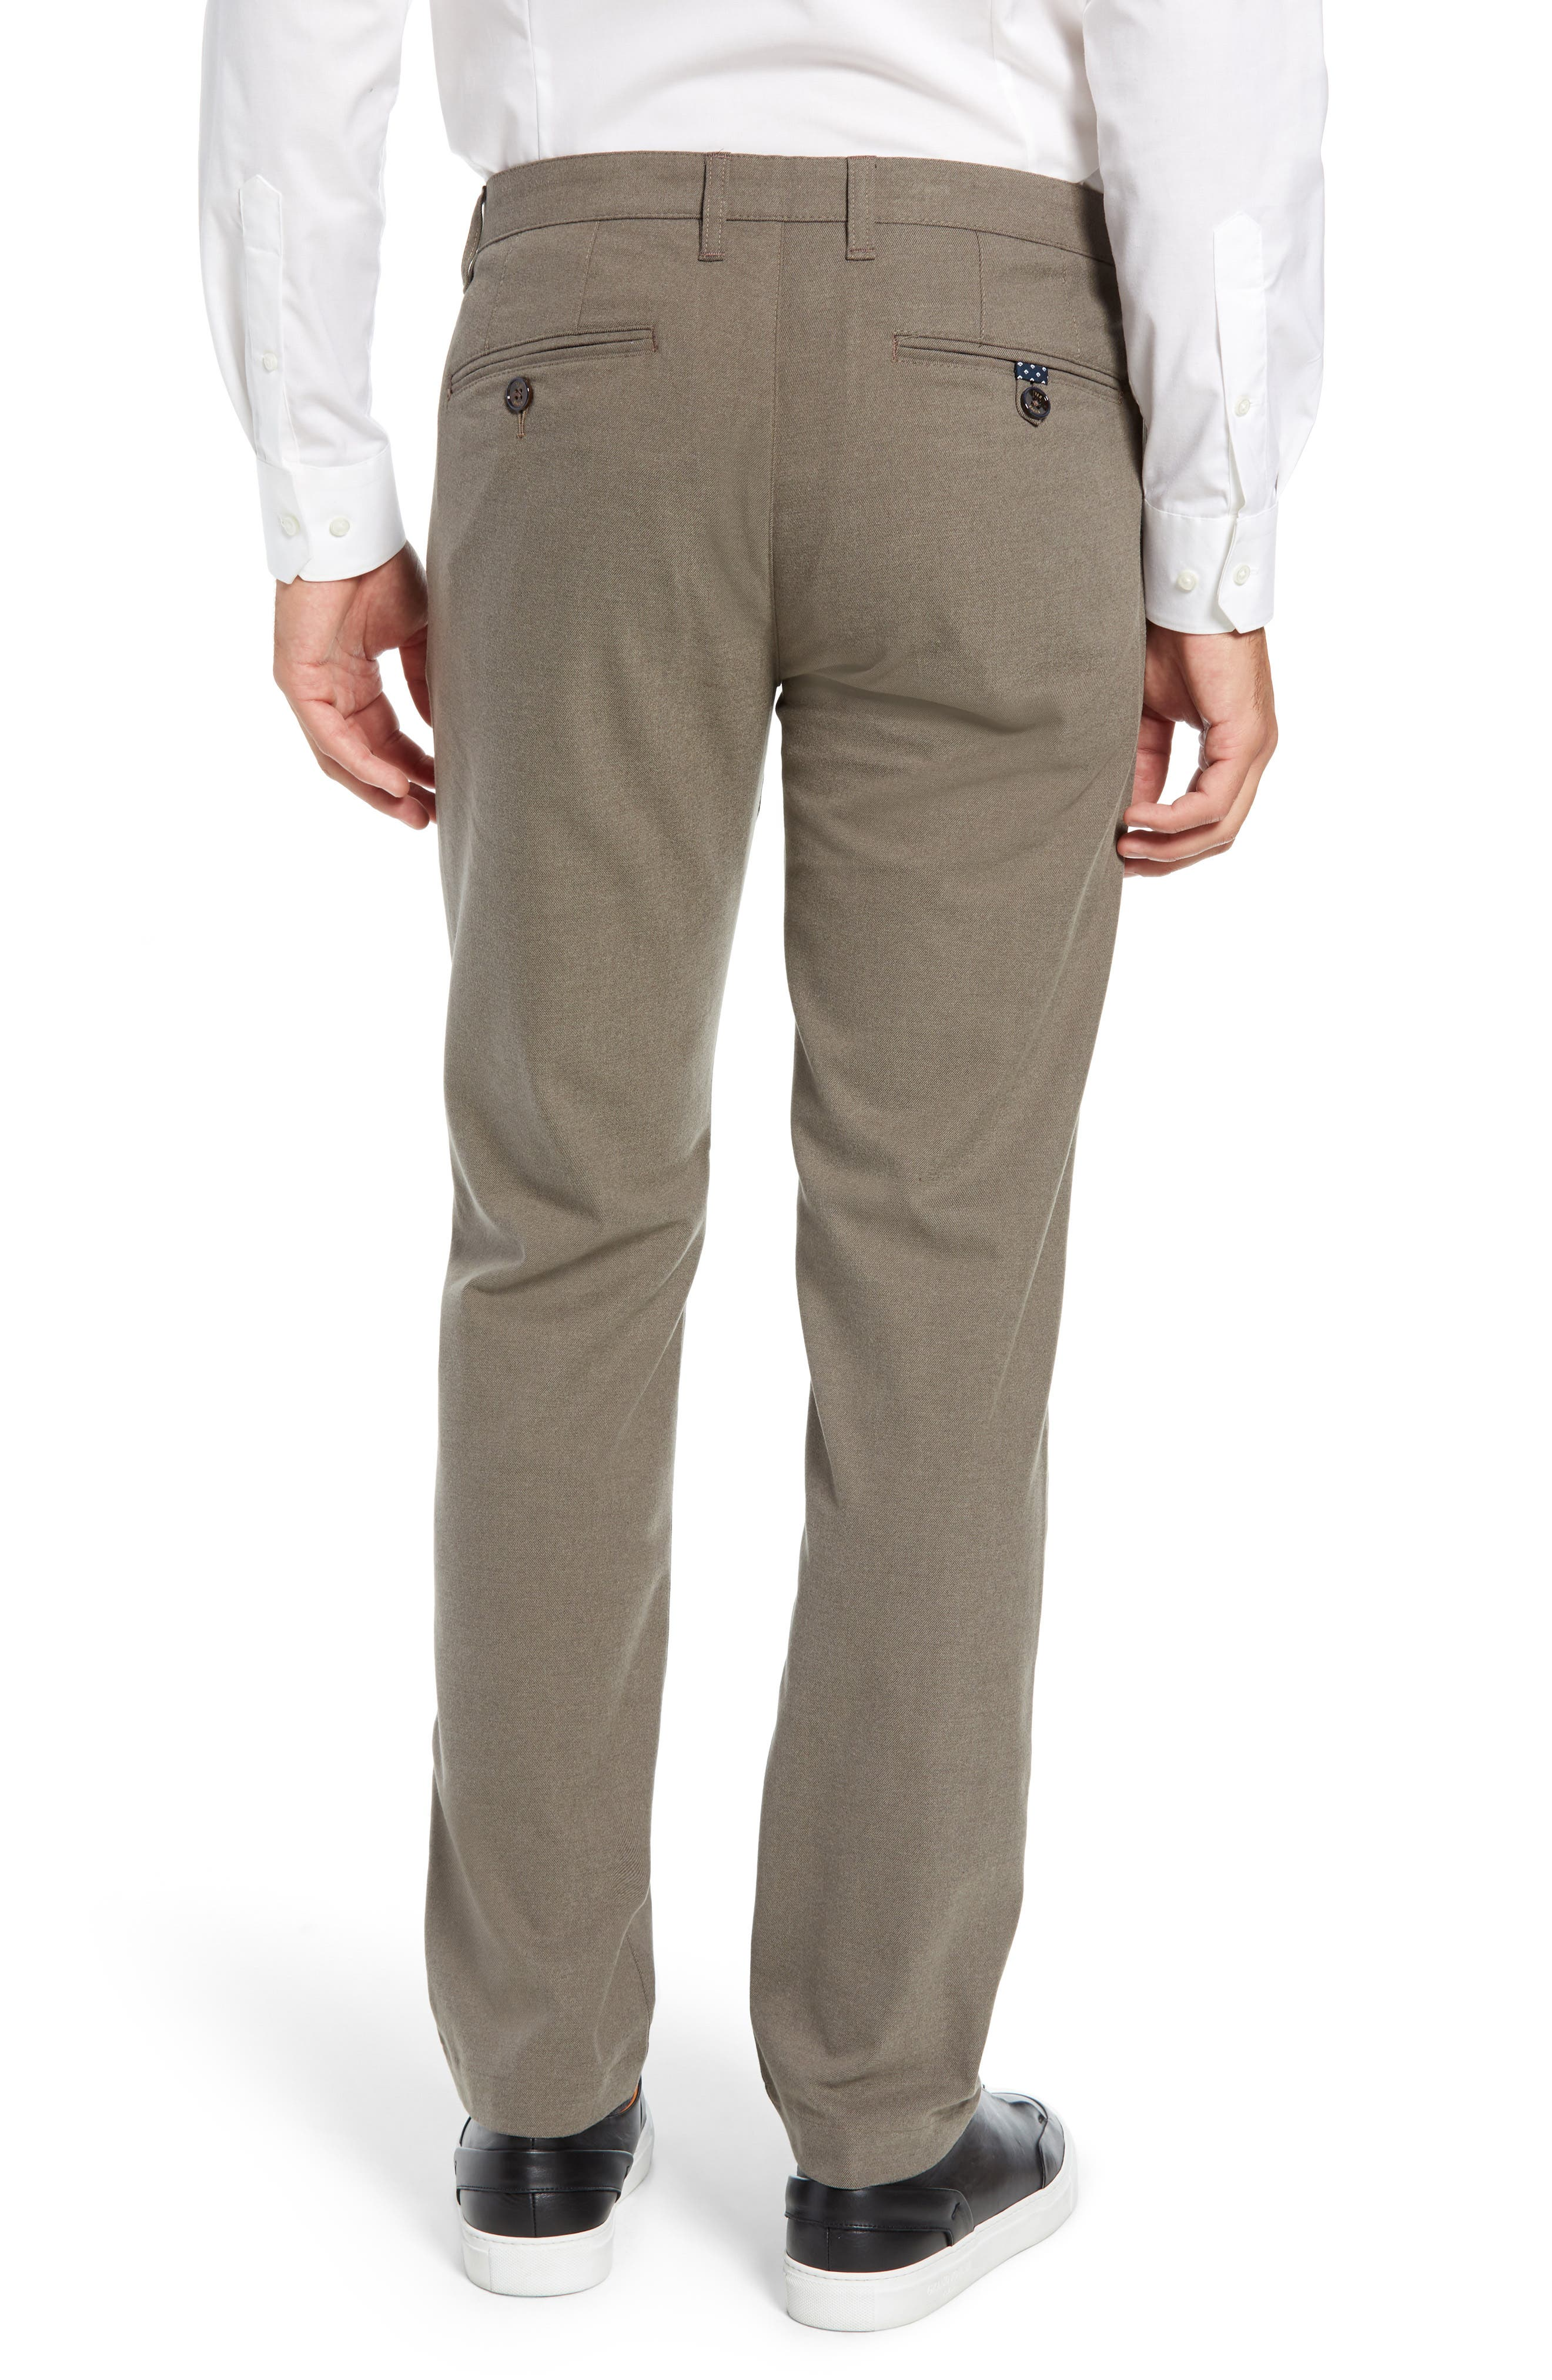 Semplin Slim Fit Brushed Trousers,                             Alternate thumbnail 2, color,                             NATURAL